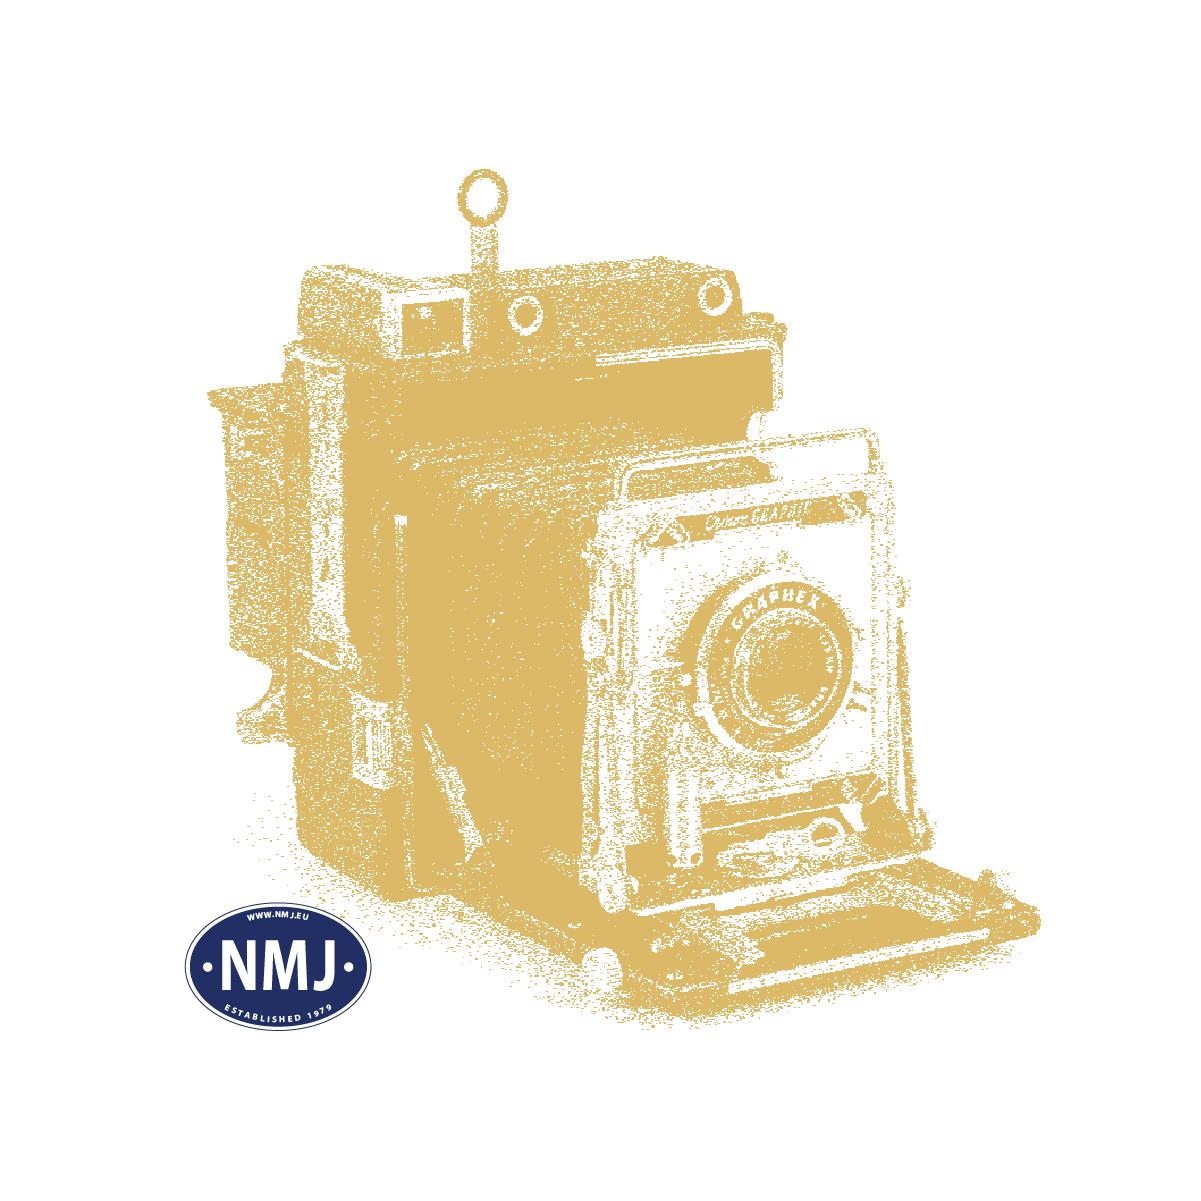 NMJT131.304 - NMJ Topline NSB B3-2 Type 3 25522, rot